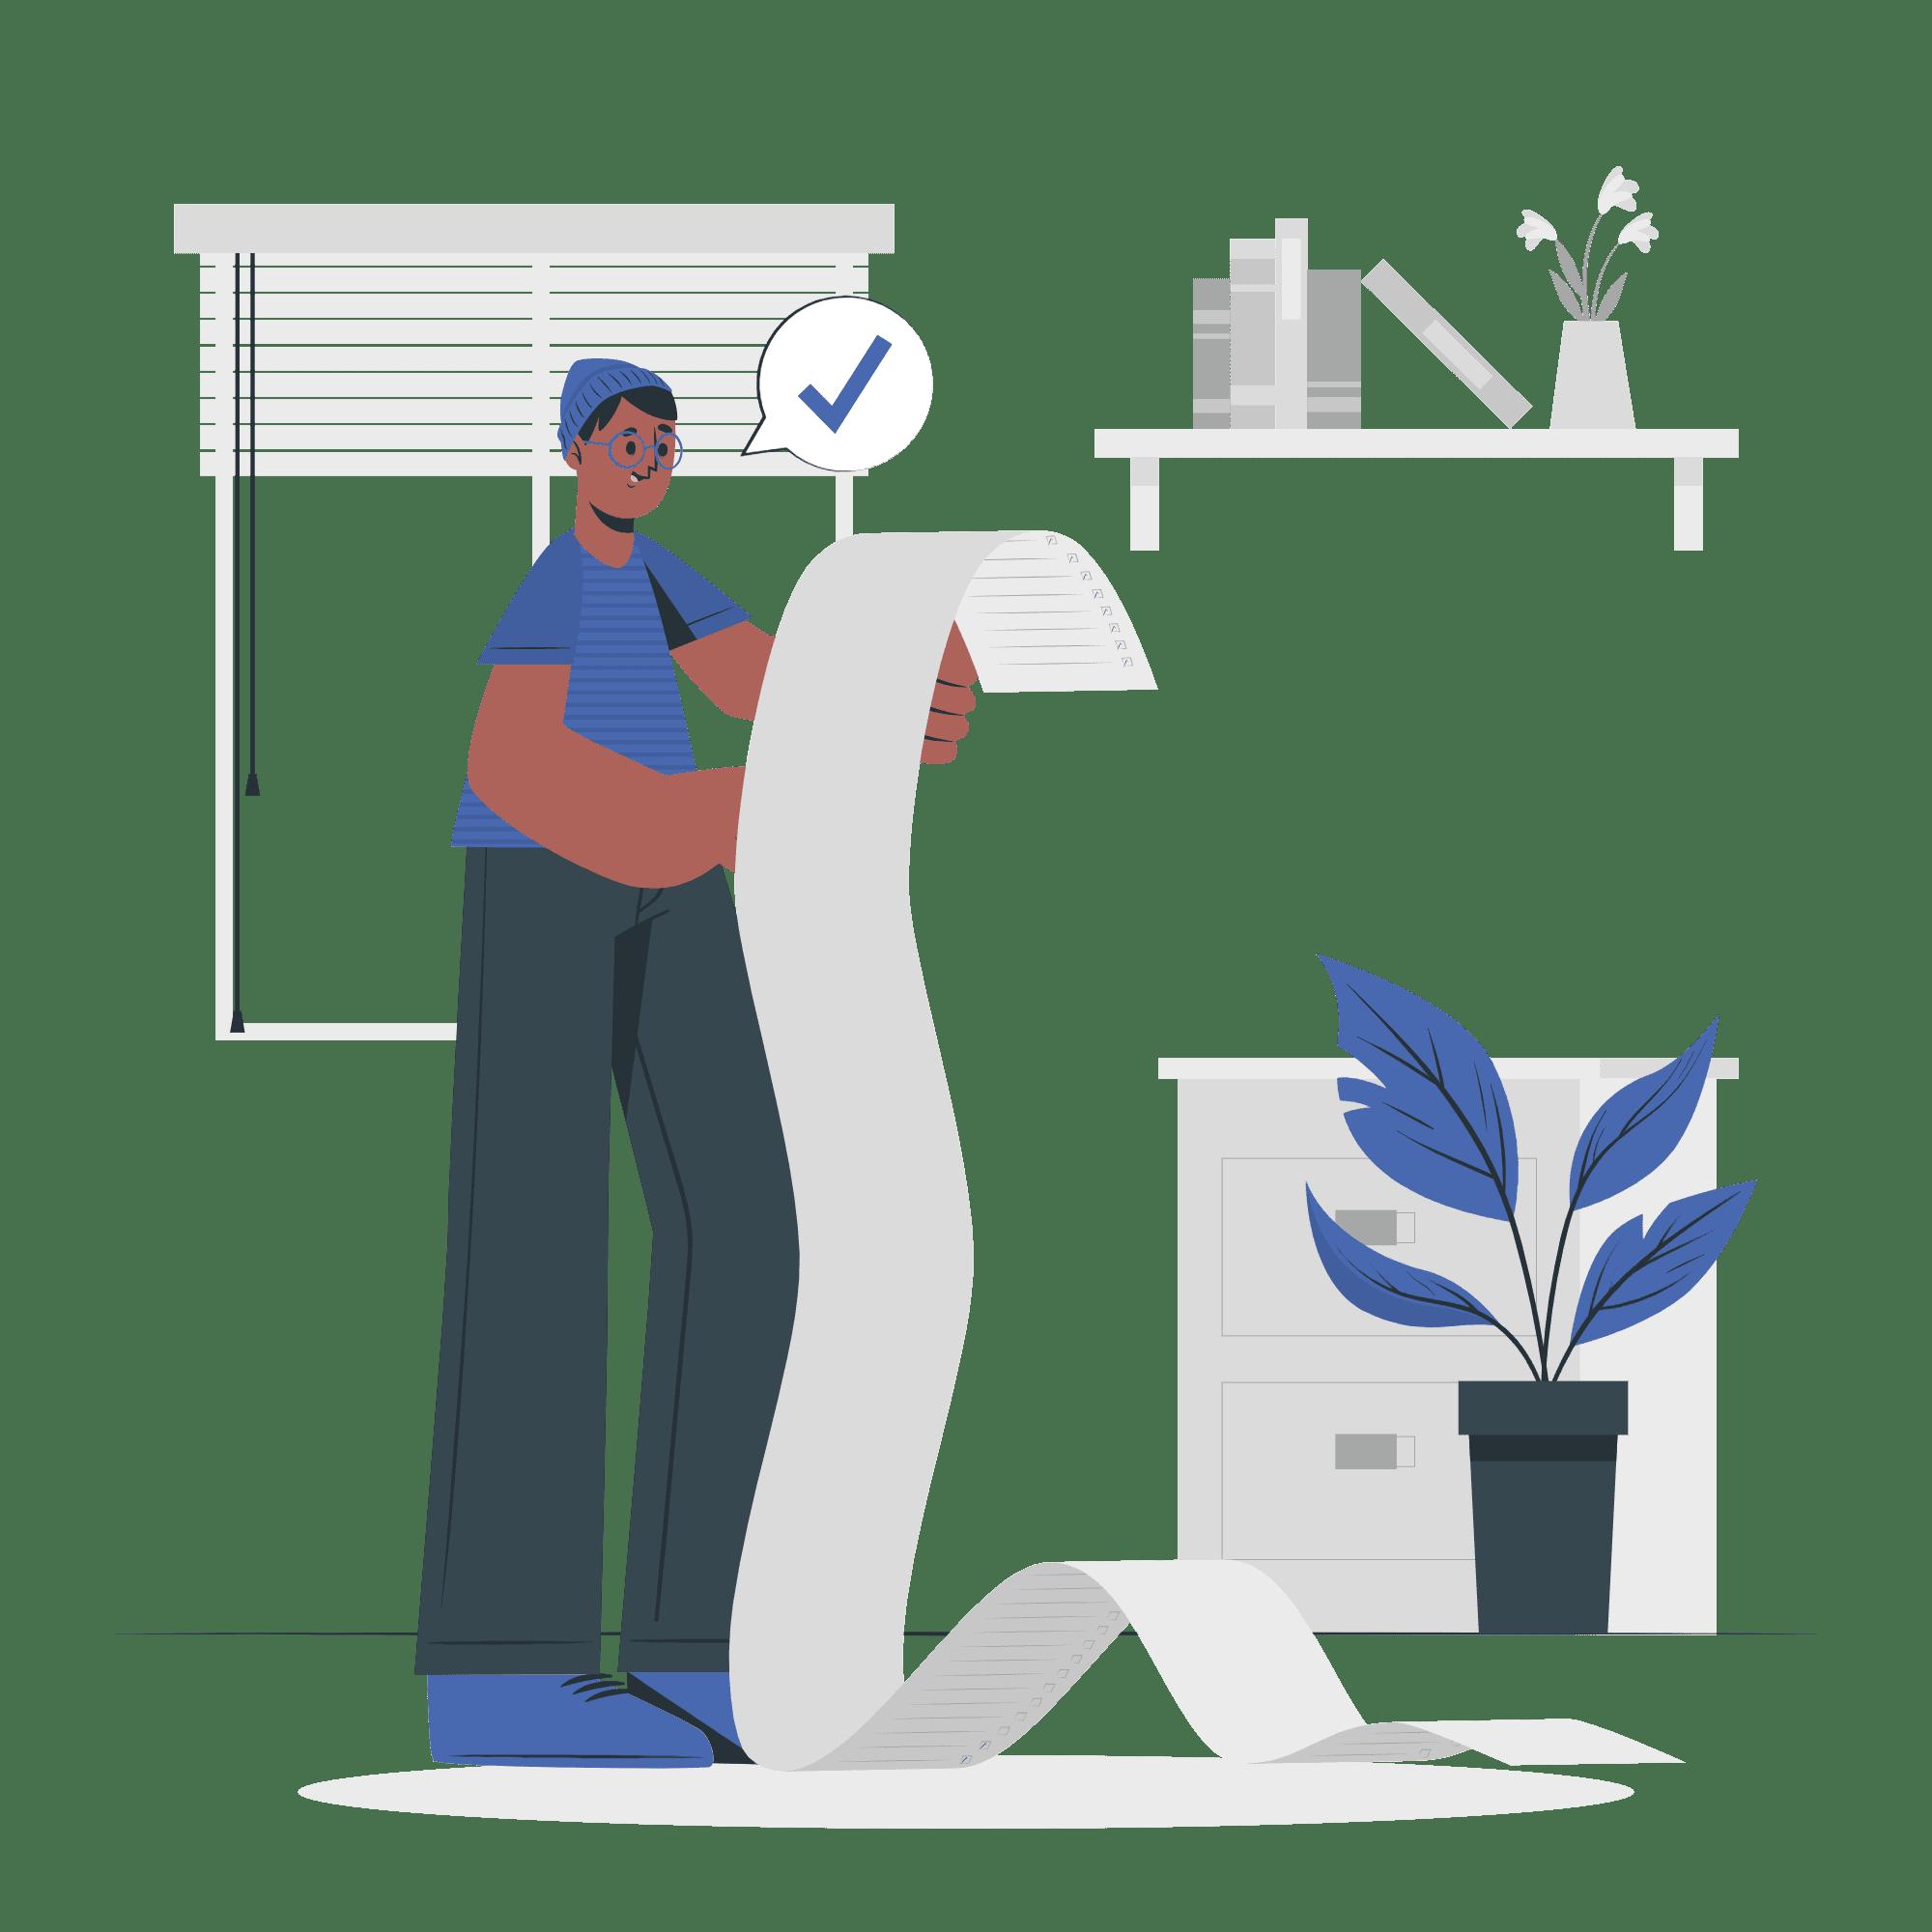 List Management Concept Illustration